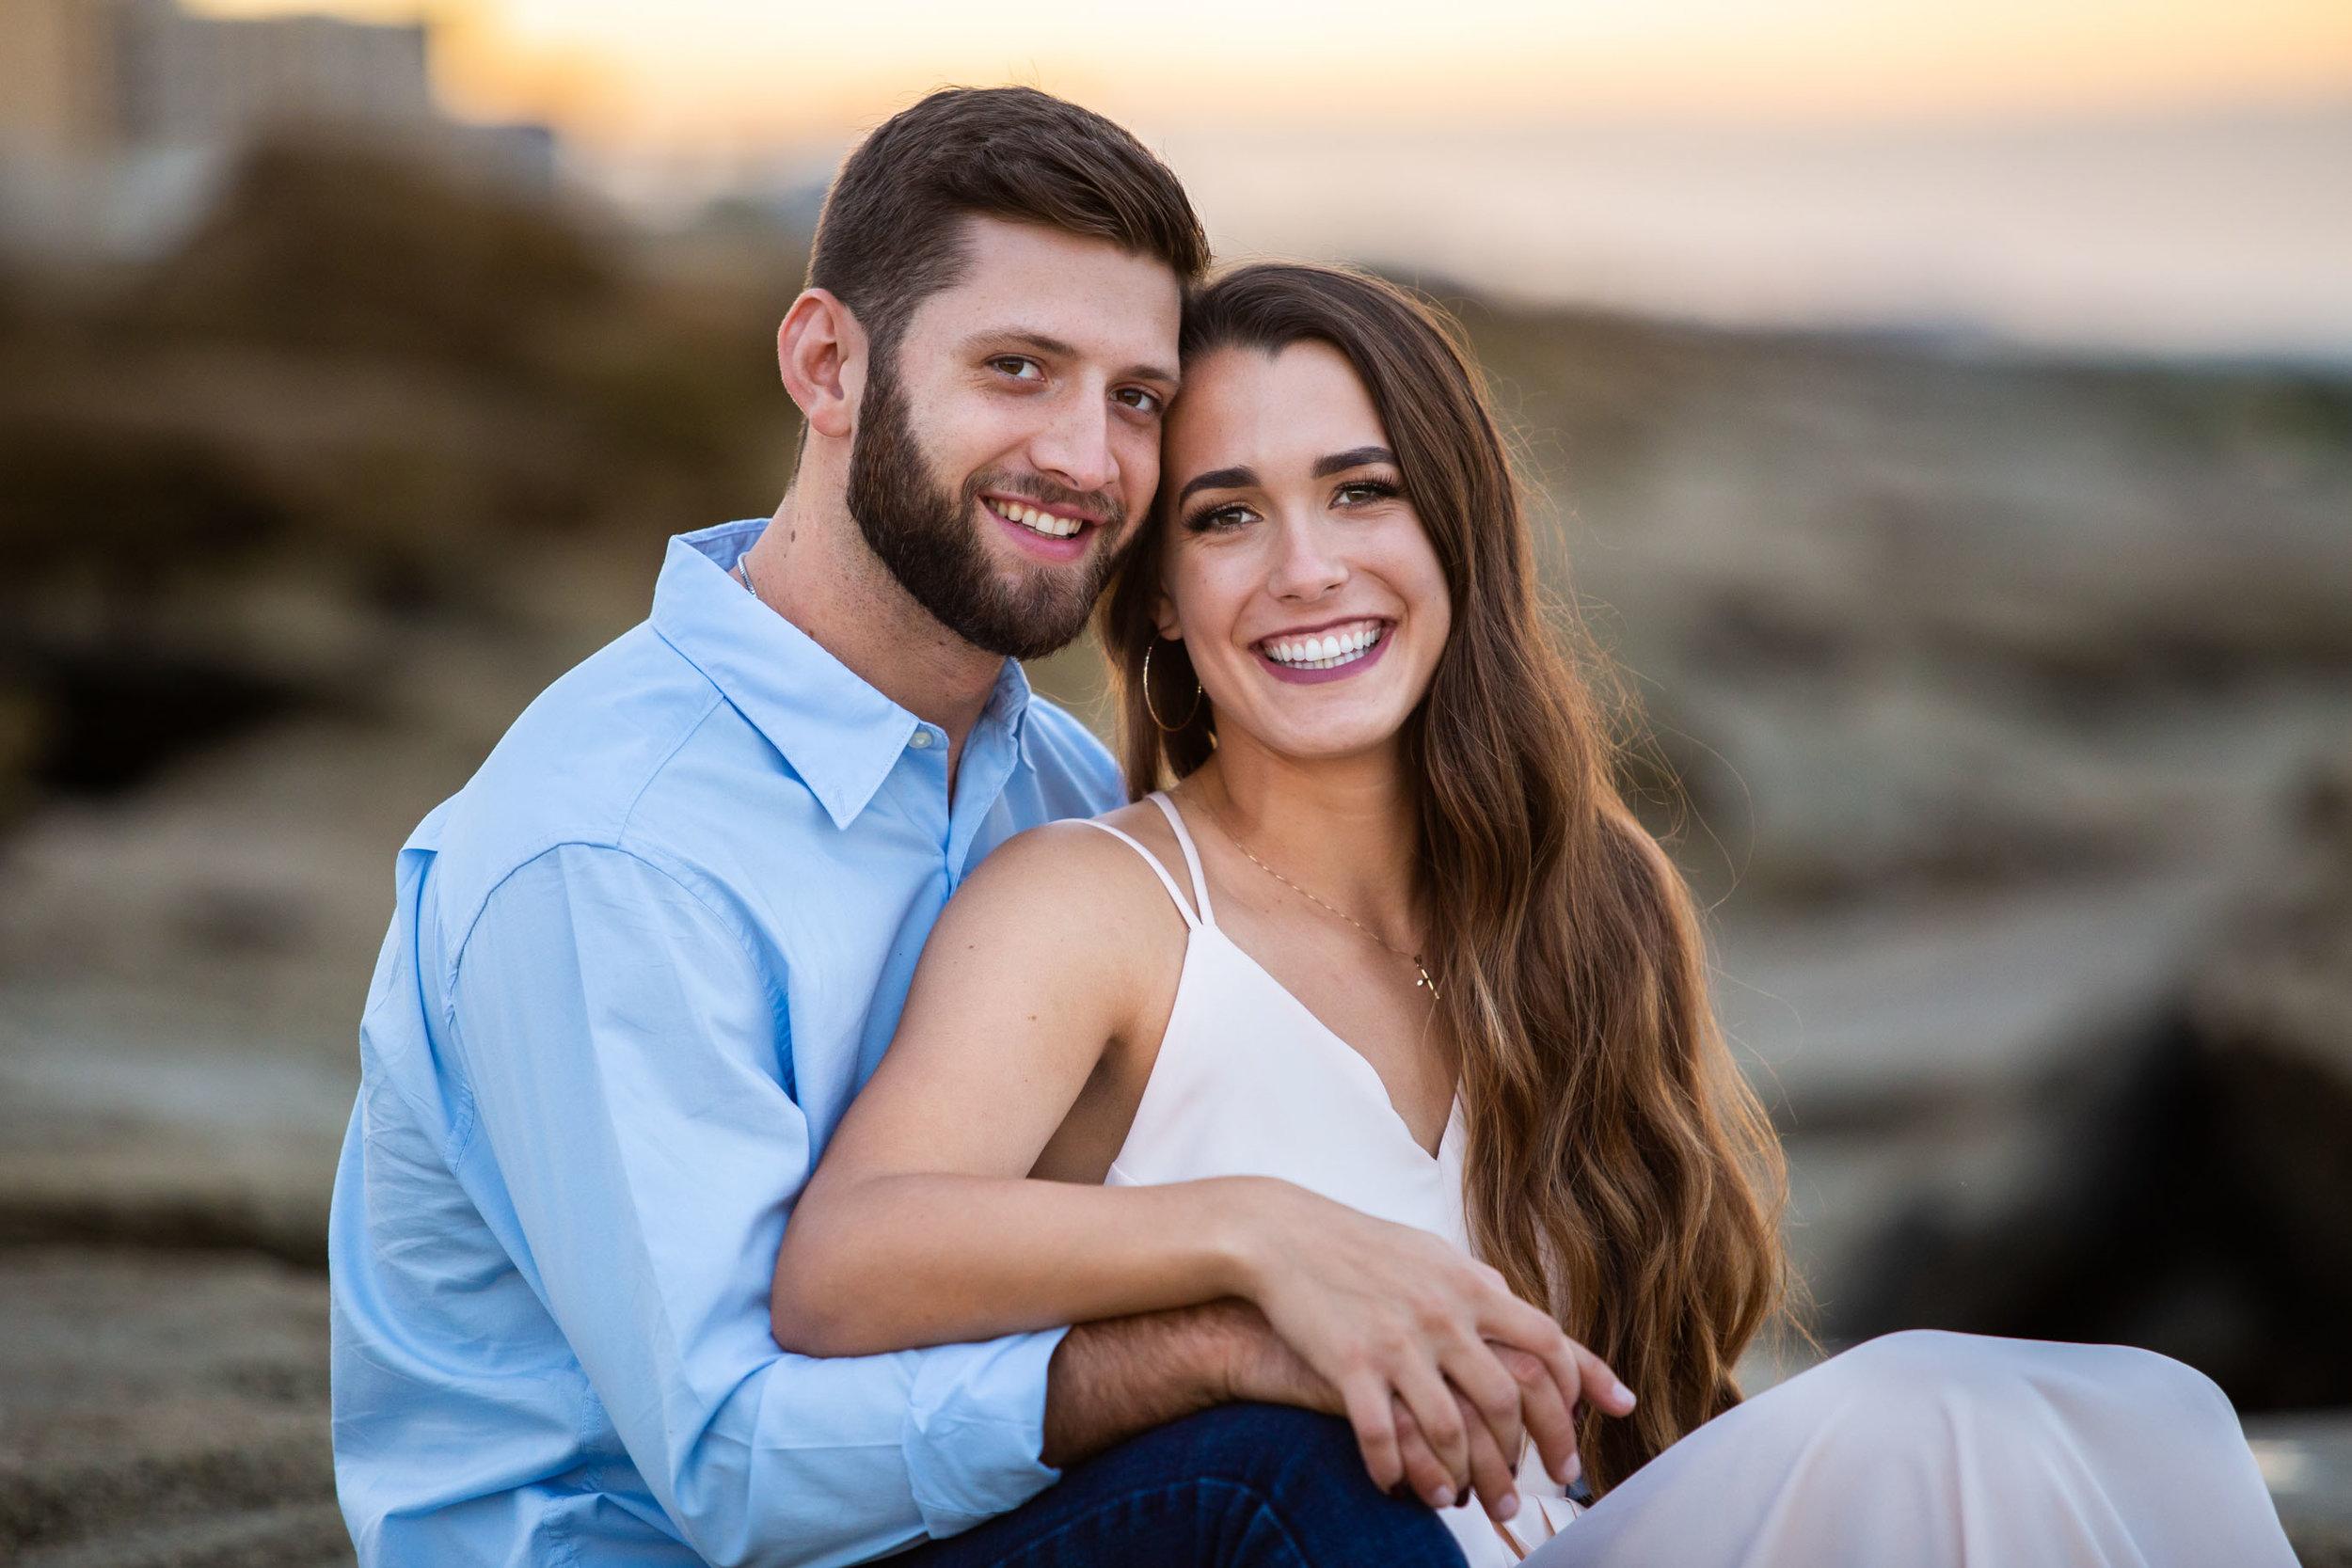 adam-szarmack-jacksonville-wedding-photographer-palm-coast-washing-oaks-garden-state-park-engagement-50.jpg